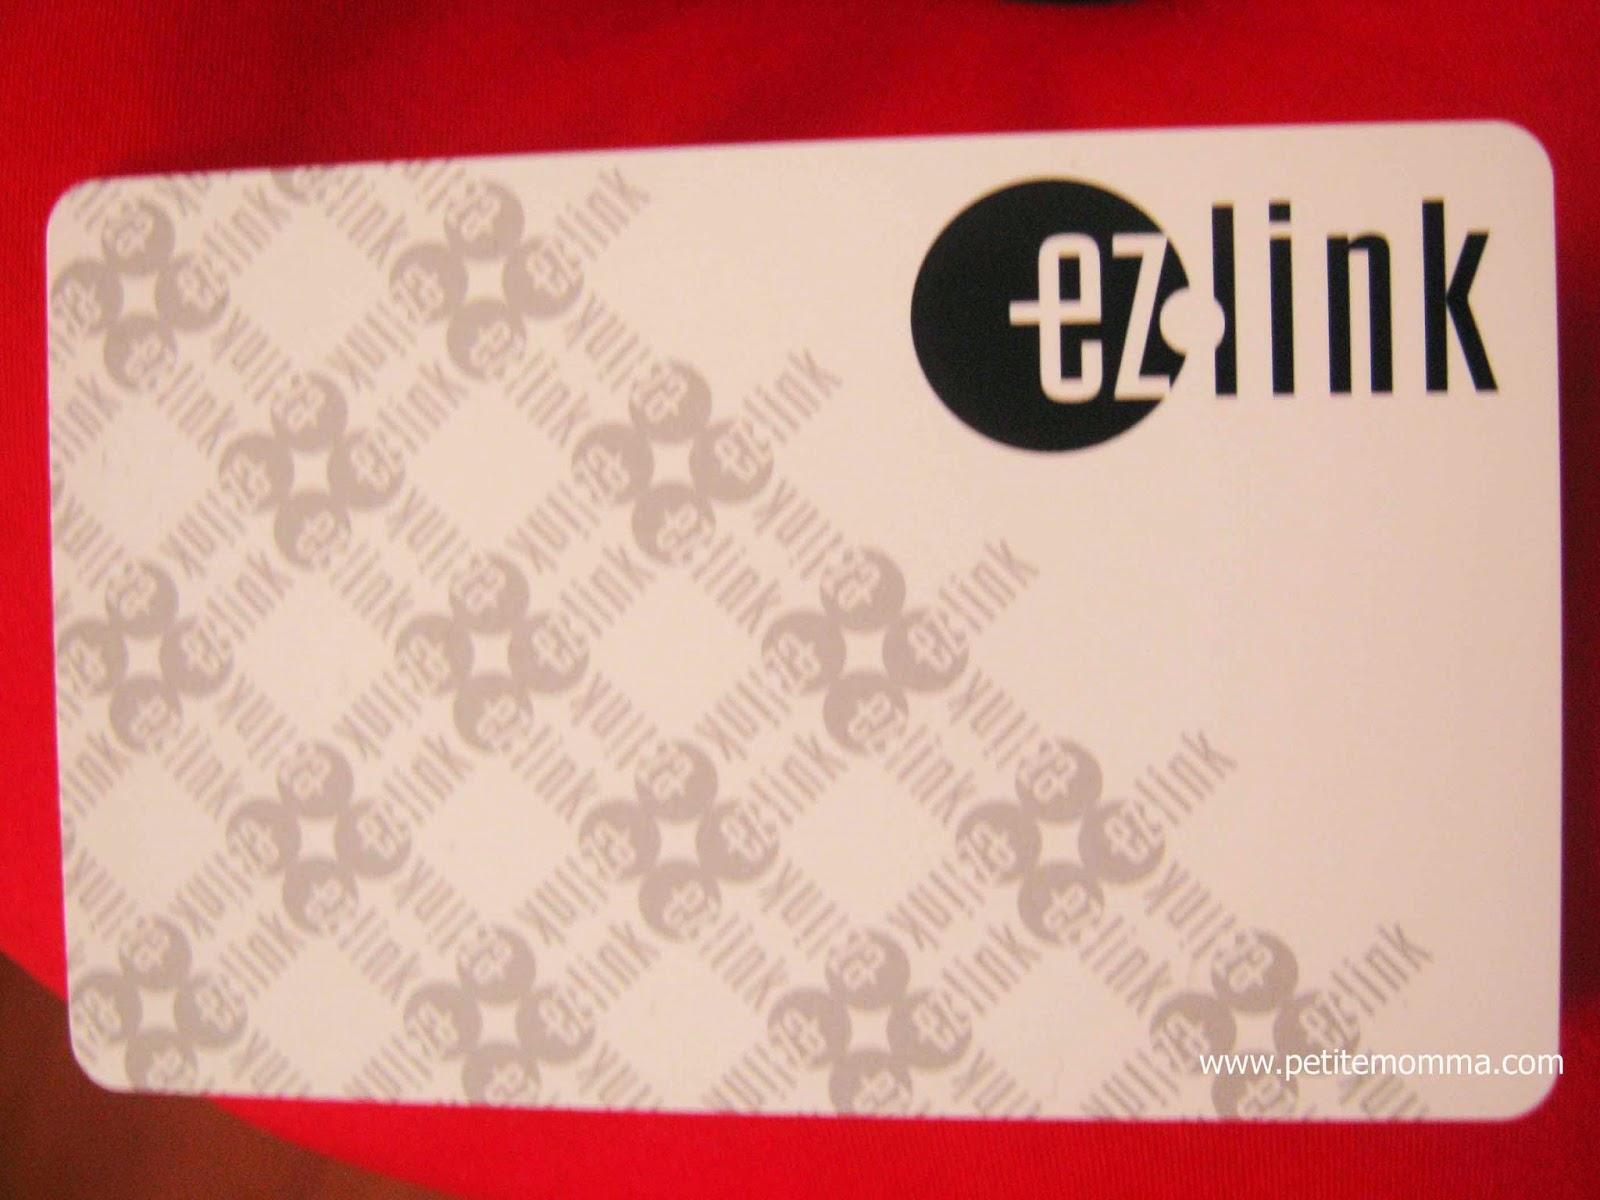 Singapore MRT card